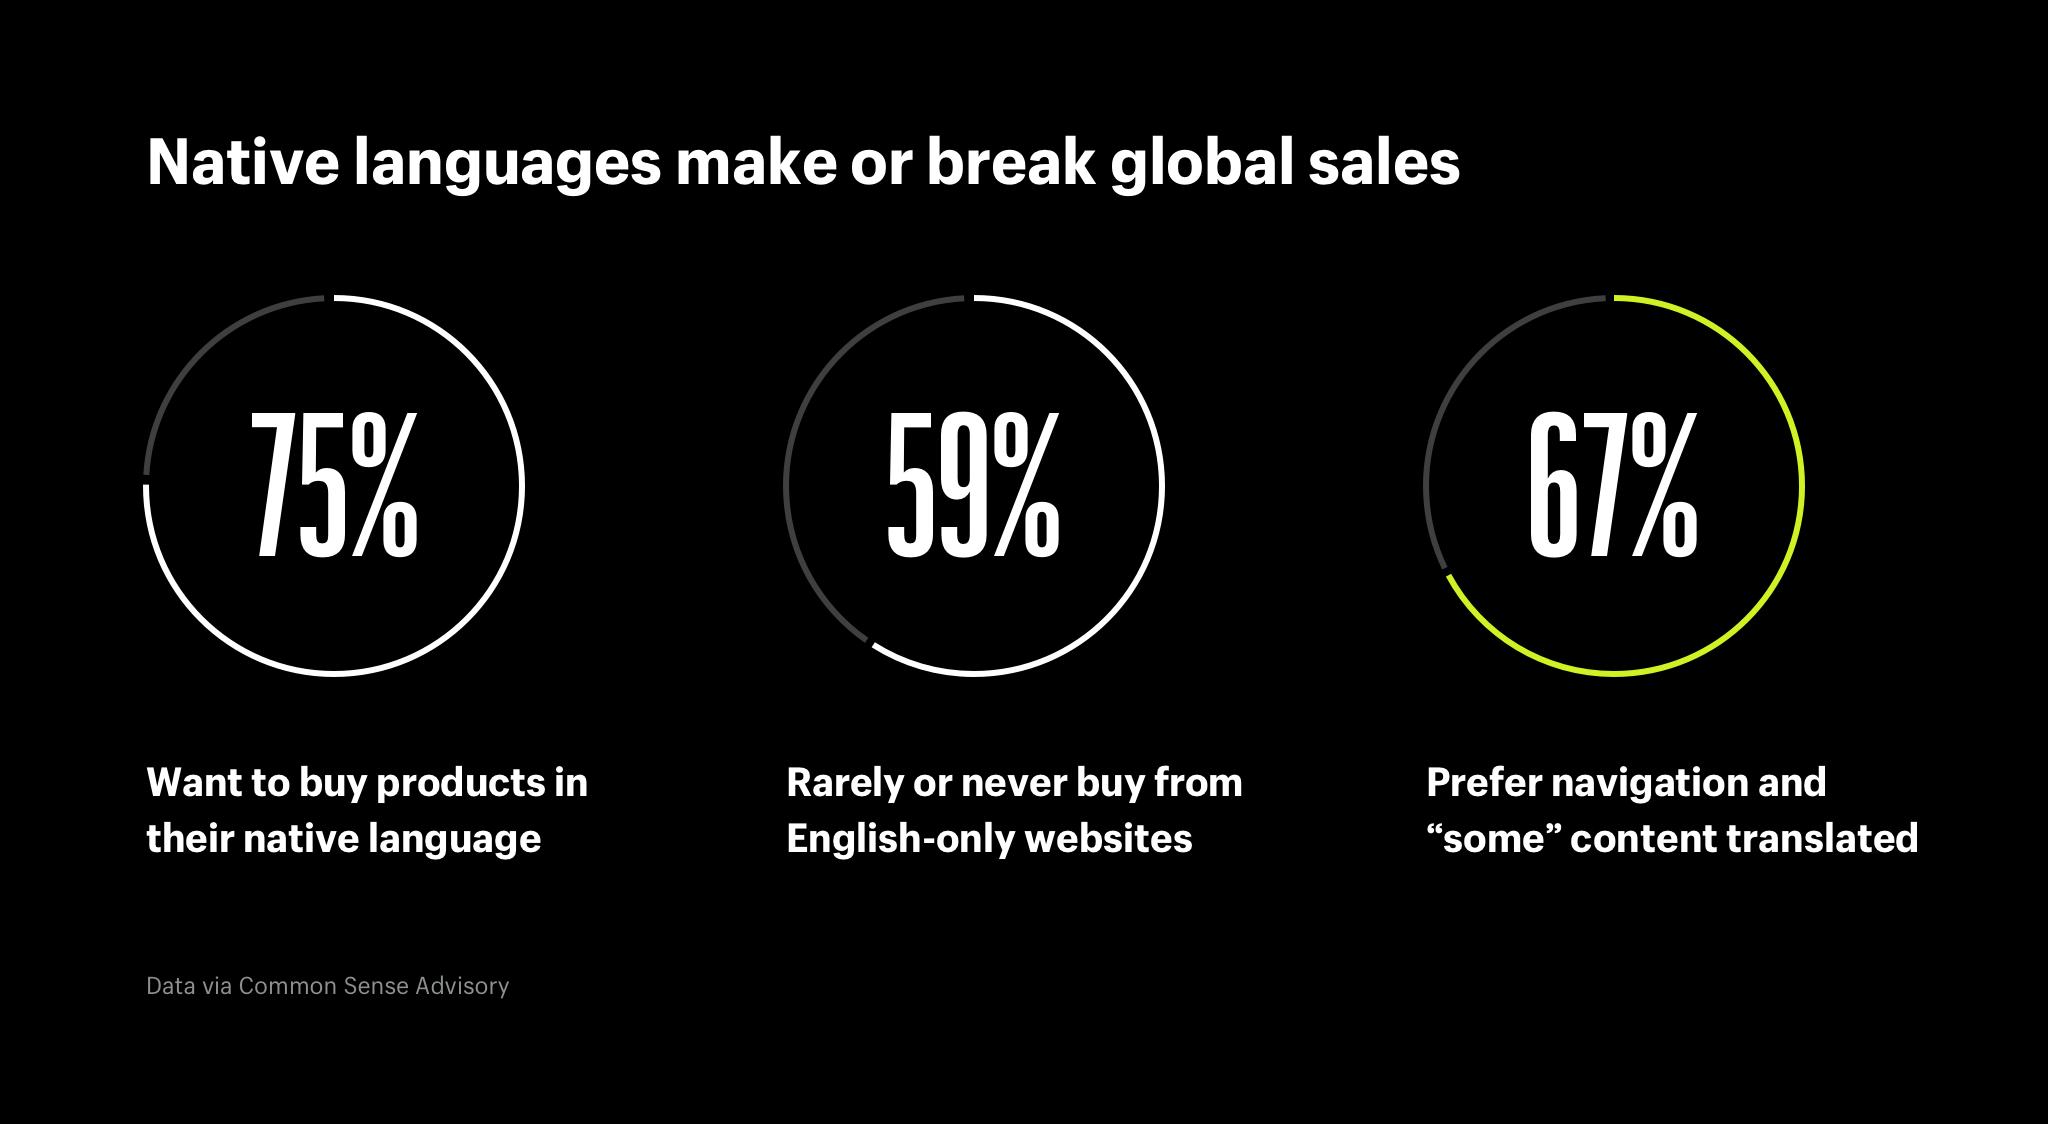 Native languages make or break global sales